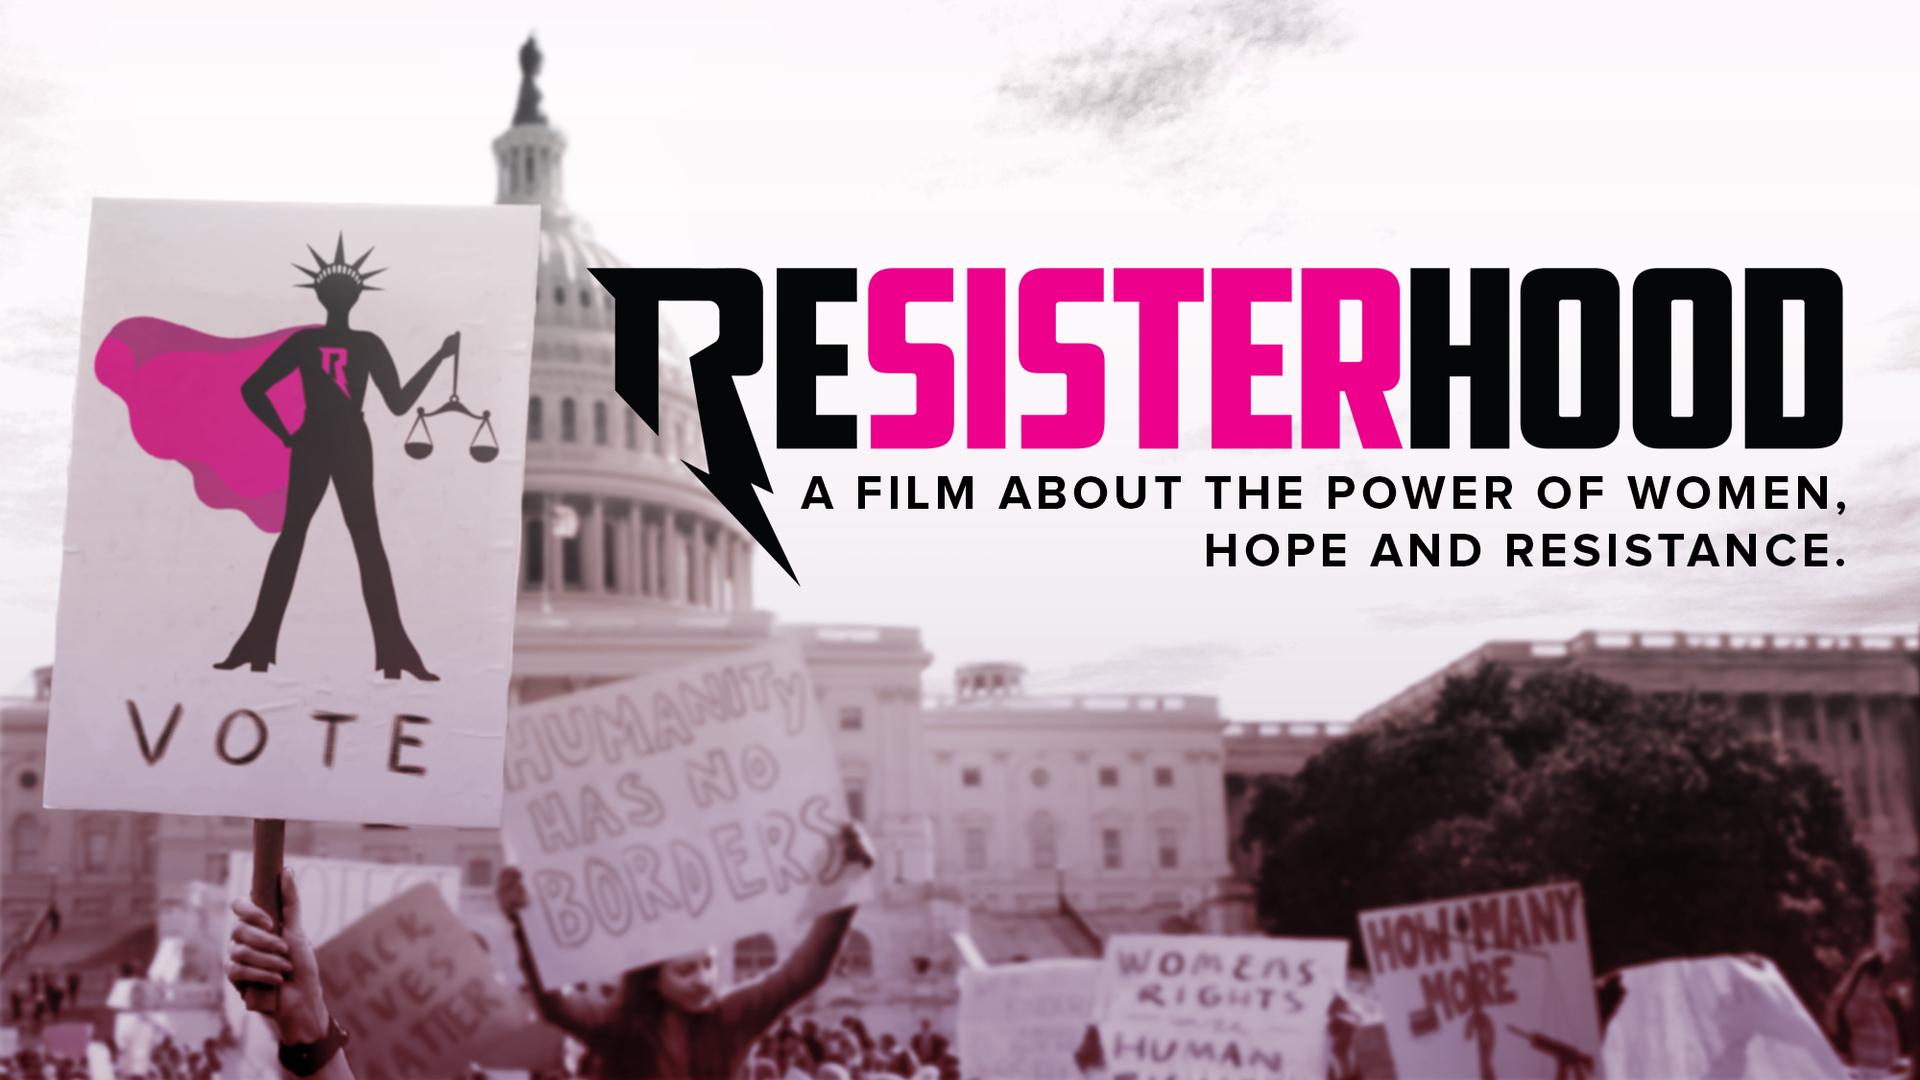 Resisterhood